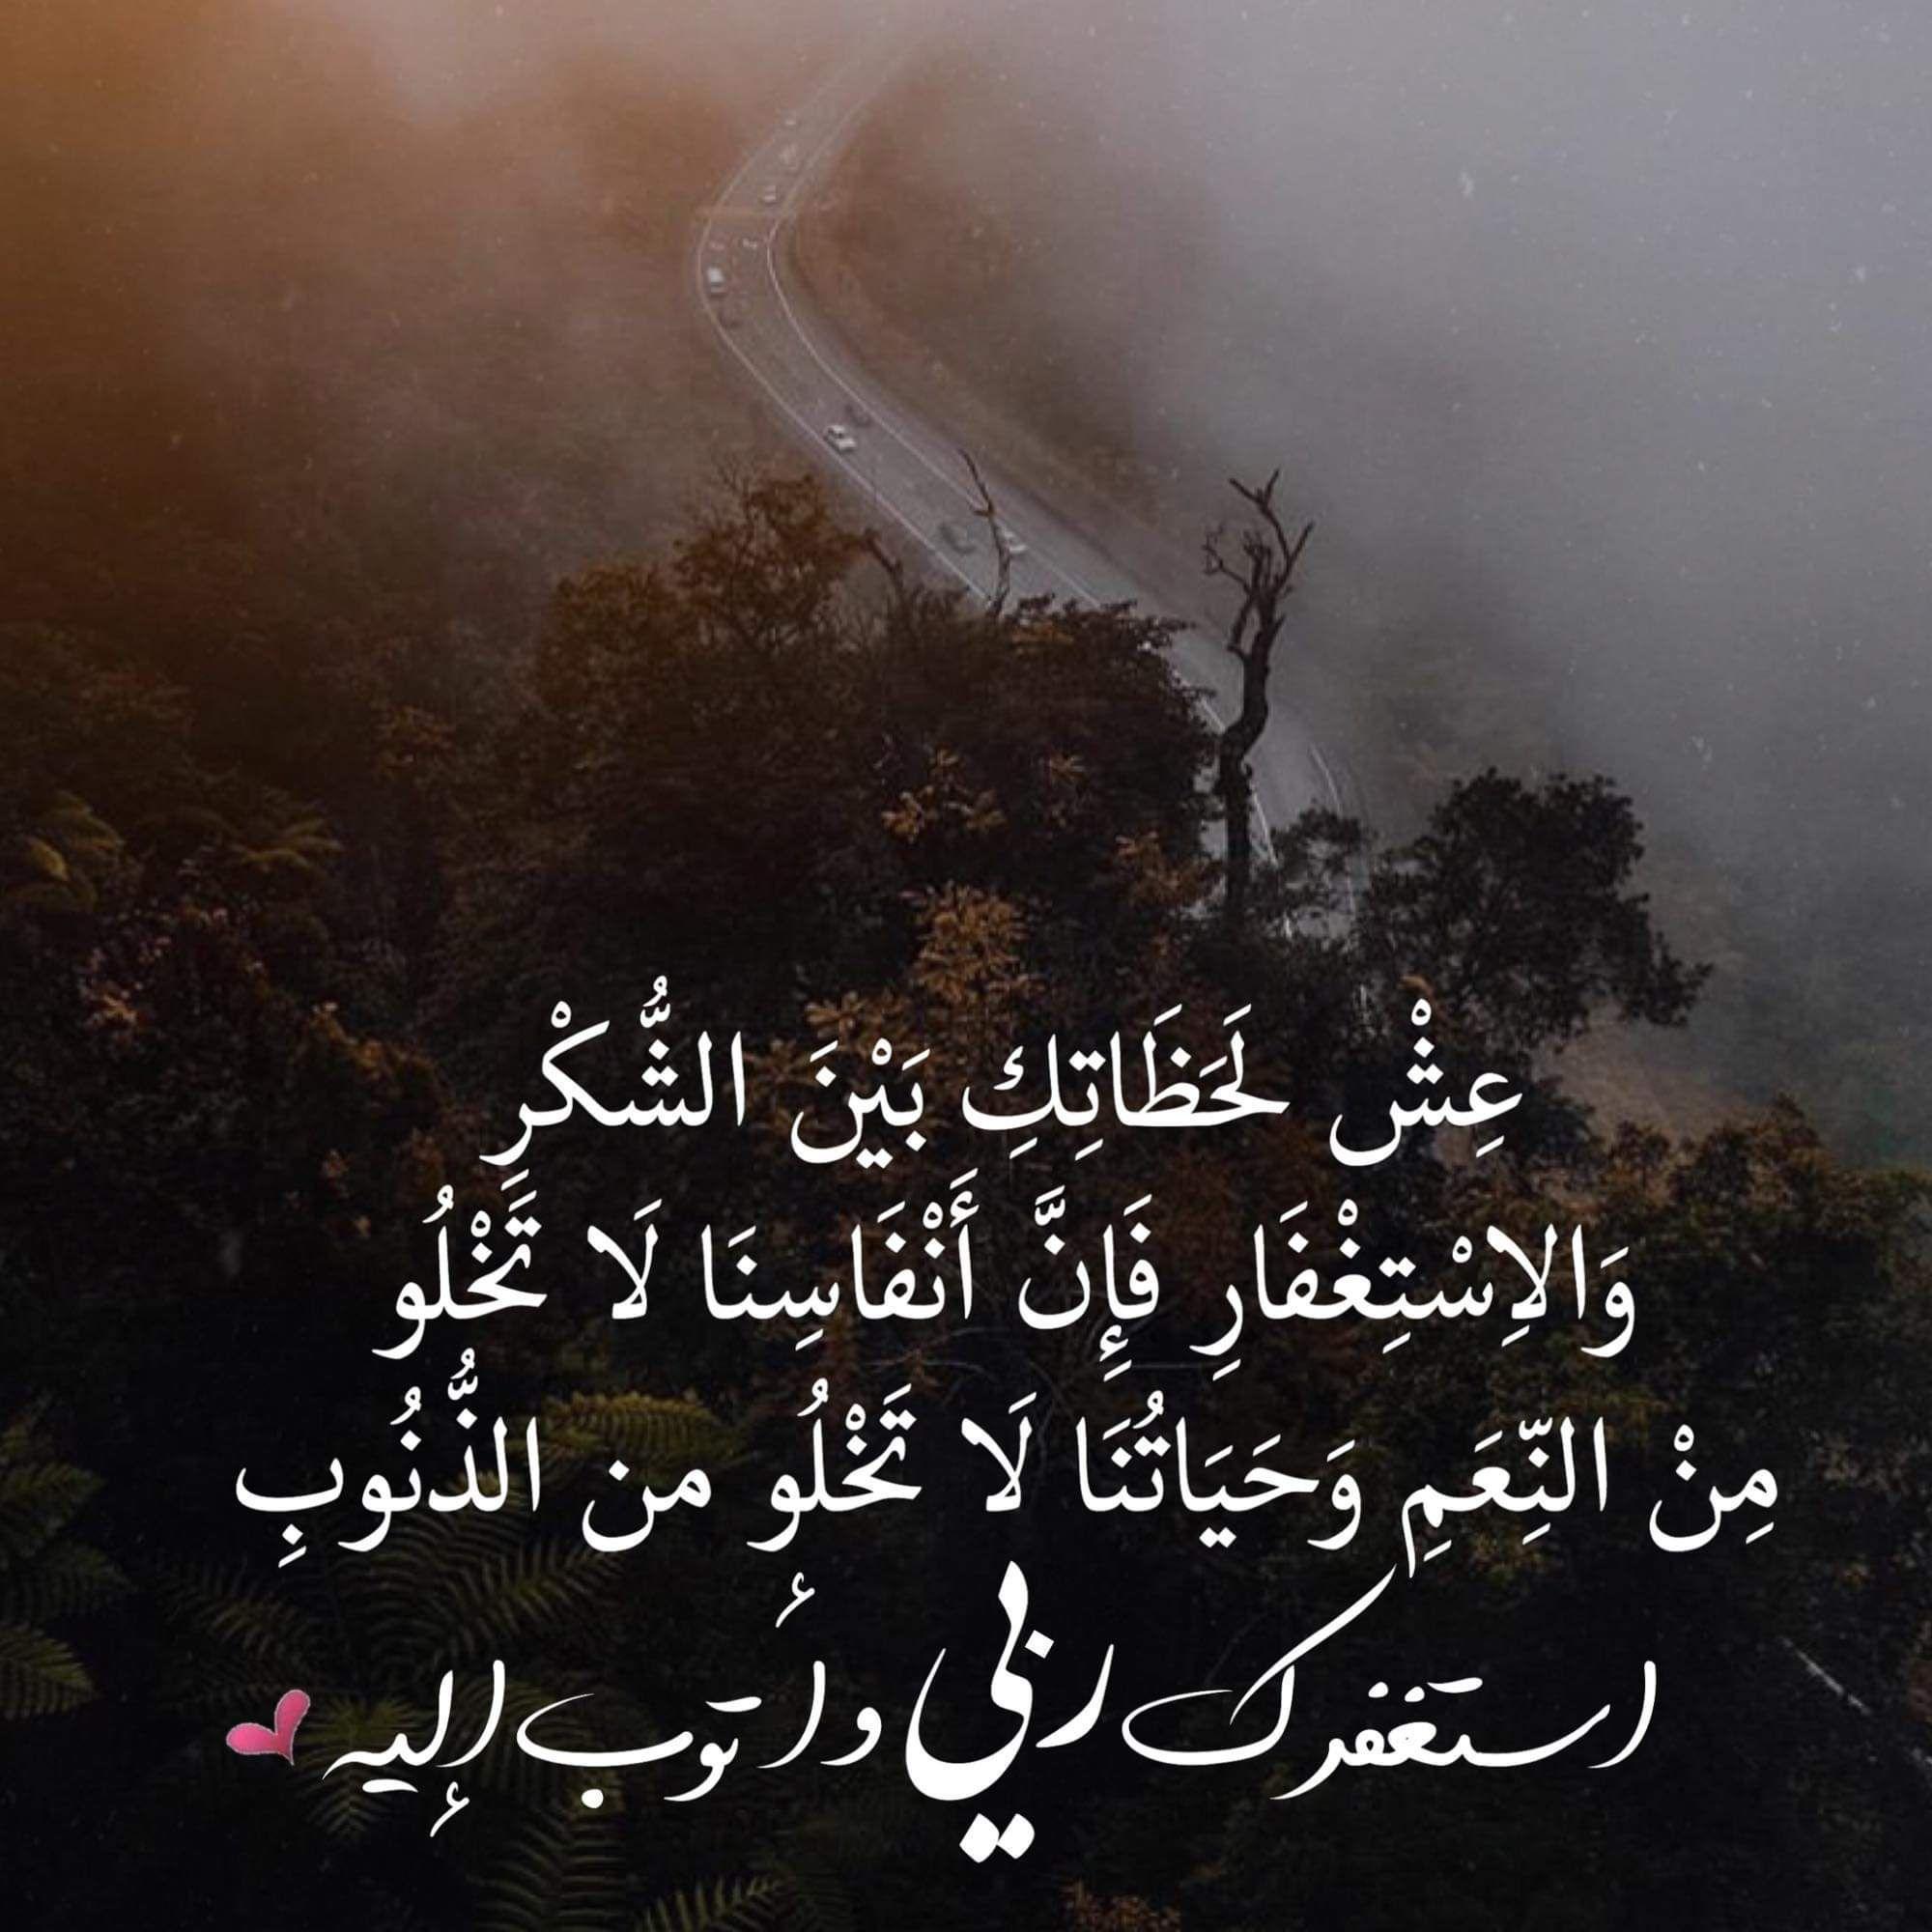 خواطر دينية قصيرة مزخرفة Lovely Quote Words Quotes Quotes